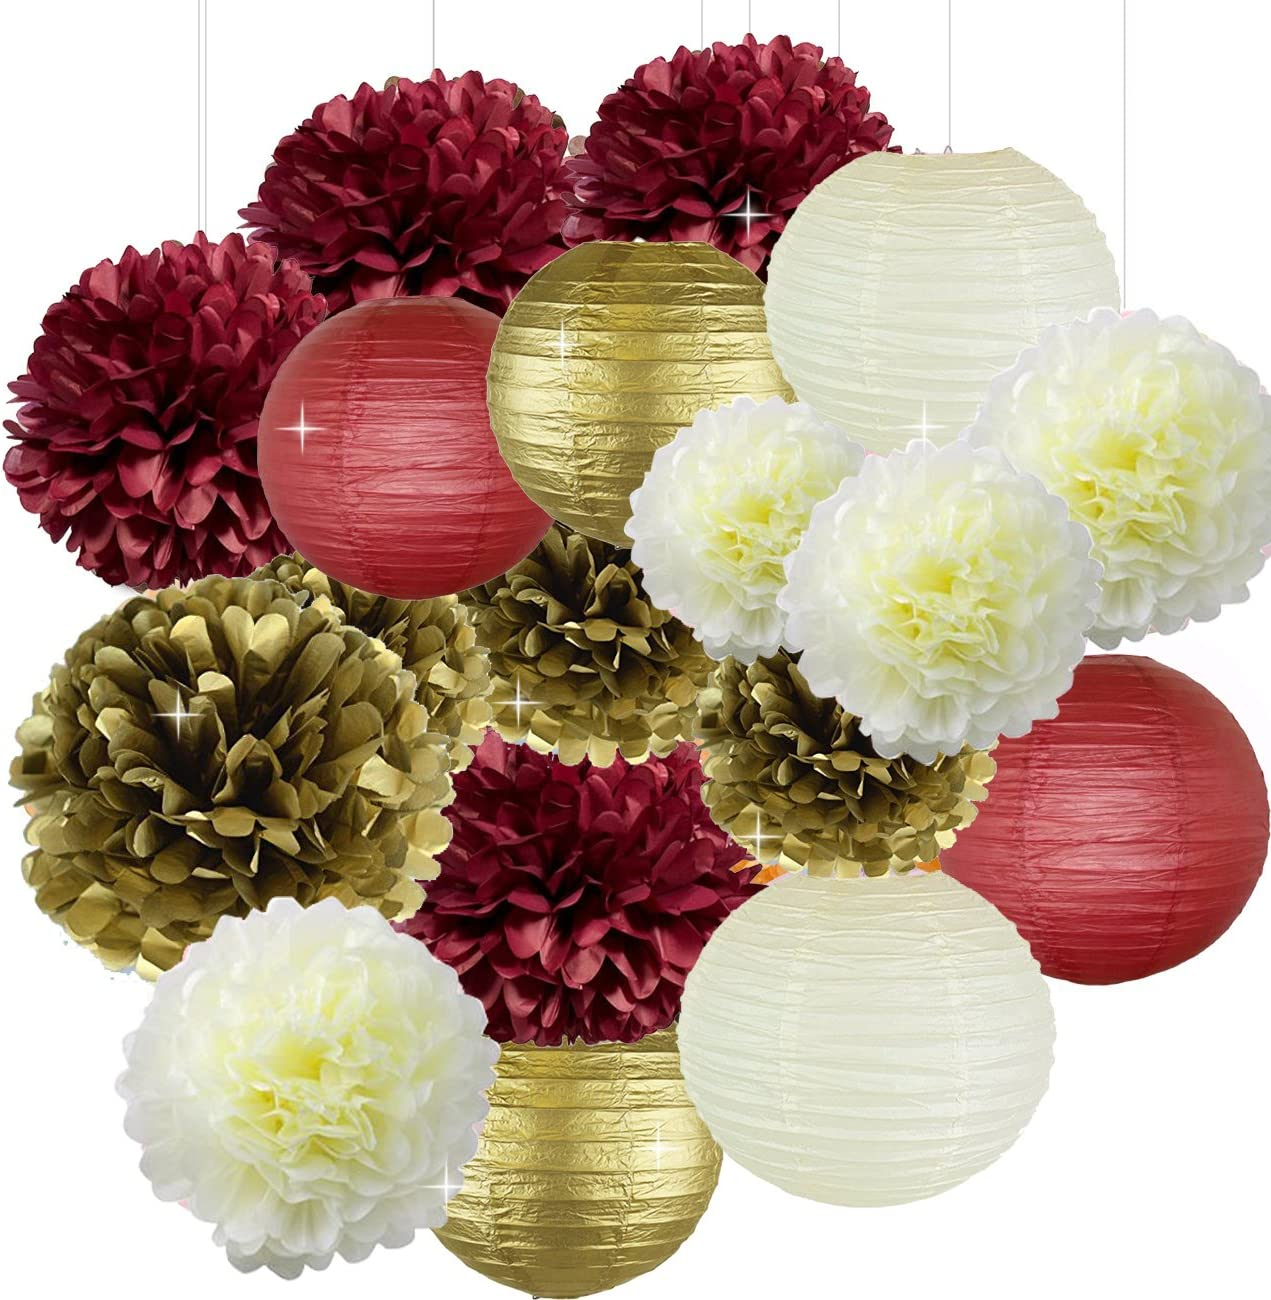 Bridal Shower Christmas Xmas Decorations 18pcs Burgundy Cream Gold Birthday Decorations Tissue Paper Pom Pom and Paper Lanterns Photo Backdrop Wedding/Bachelorette Party Decorations